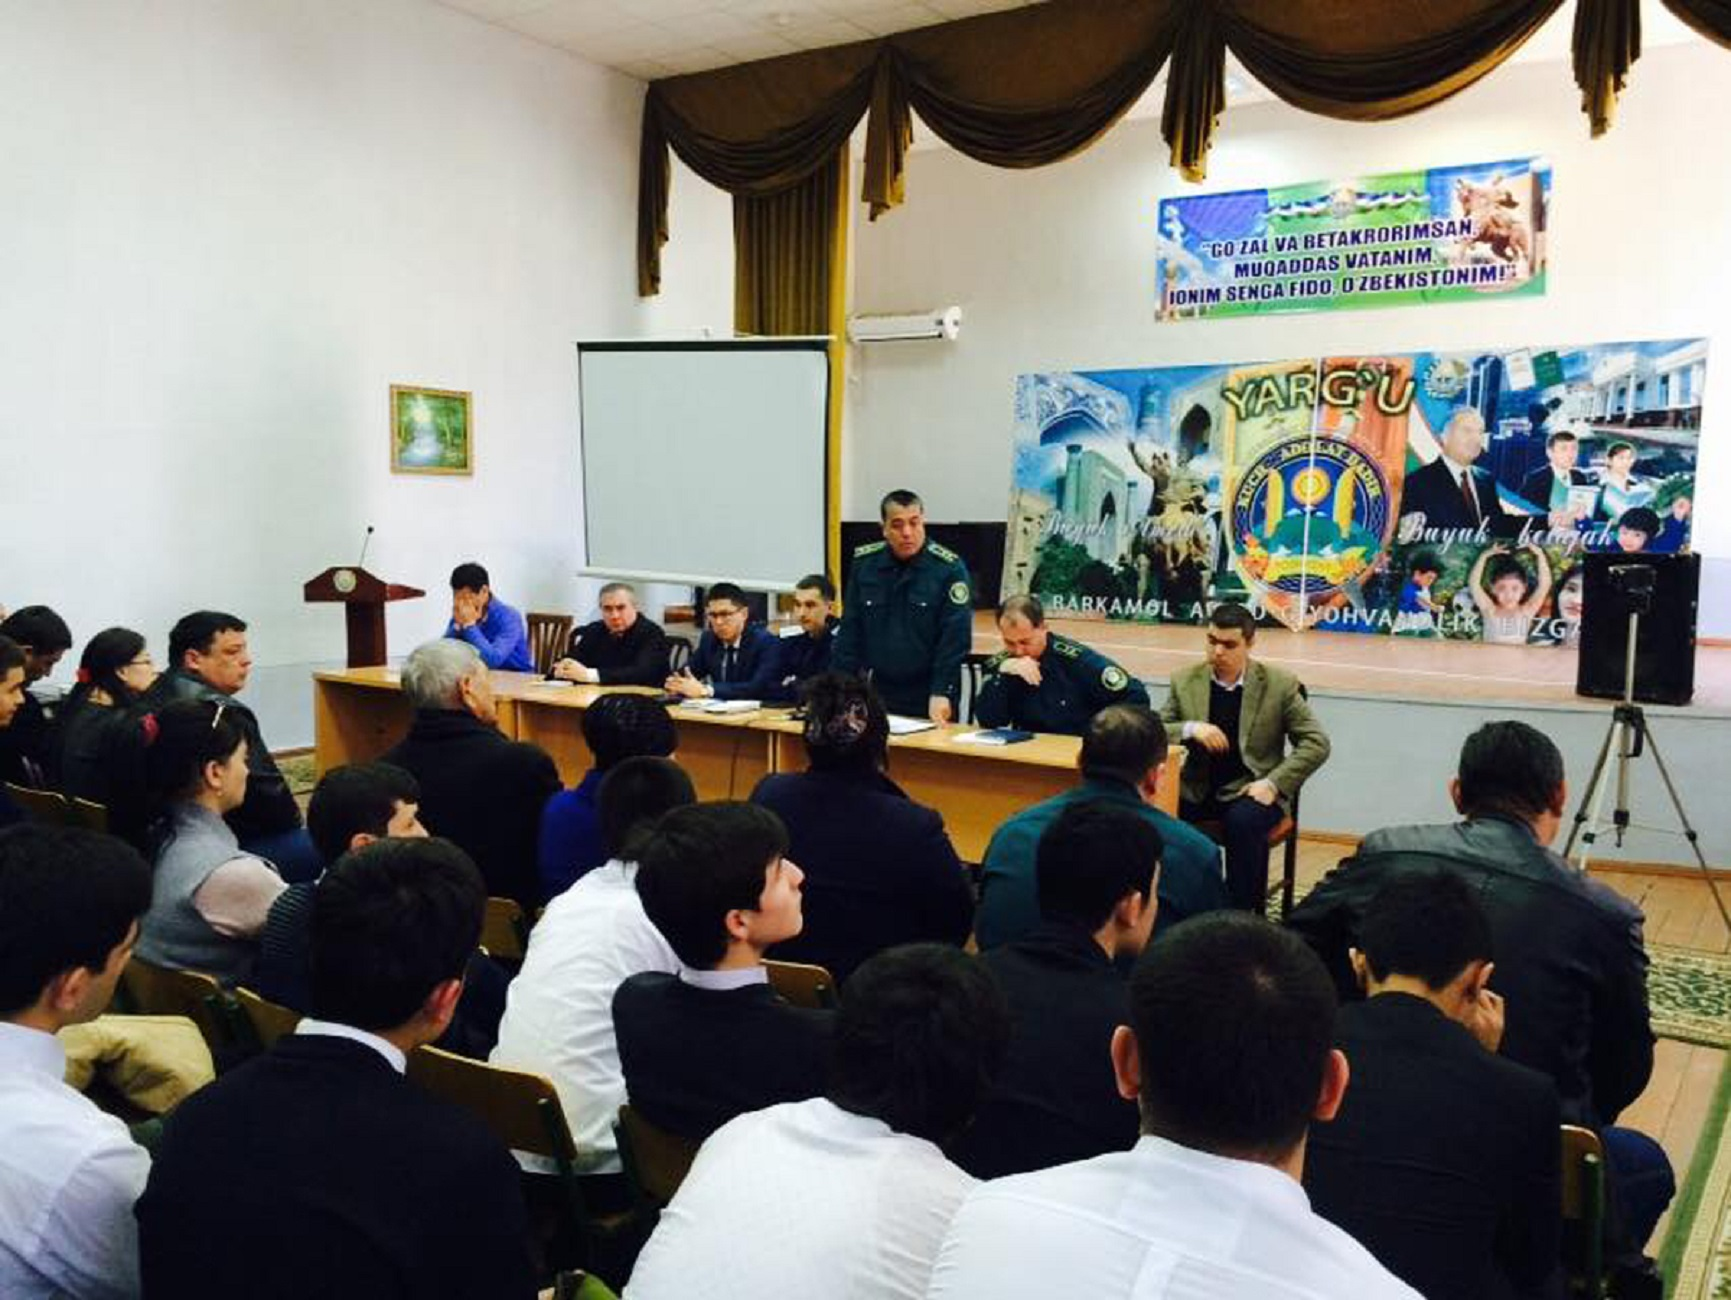 Uzbekistan increases monitoring of schools in fight against radicalisation